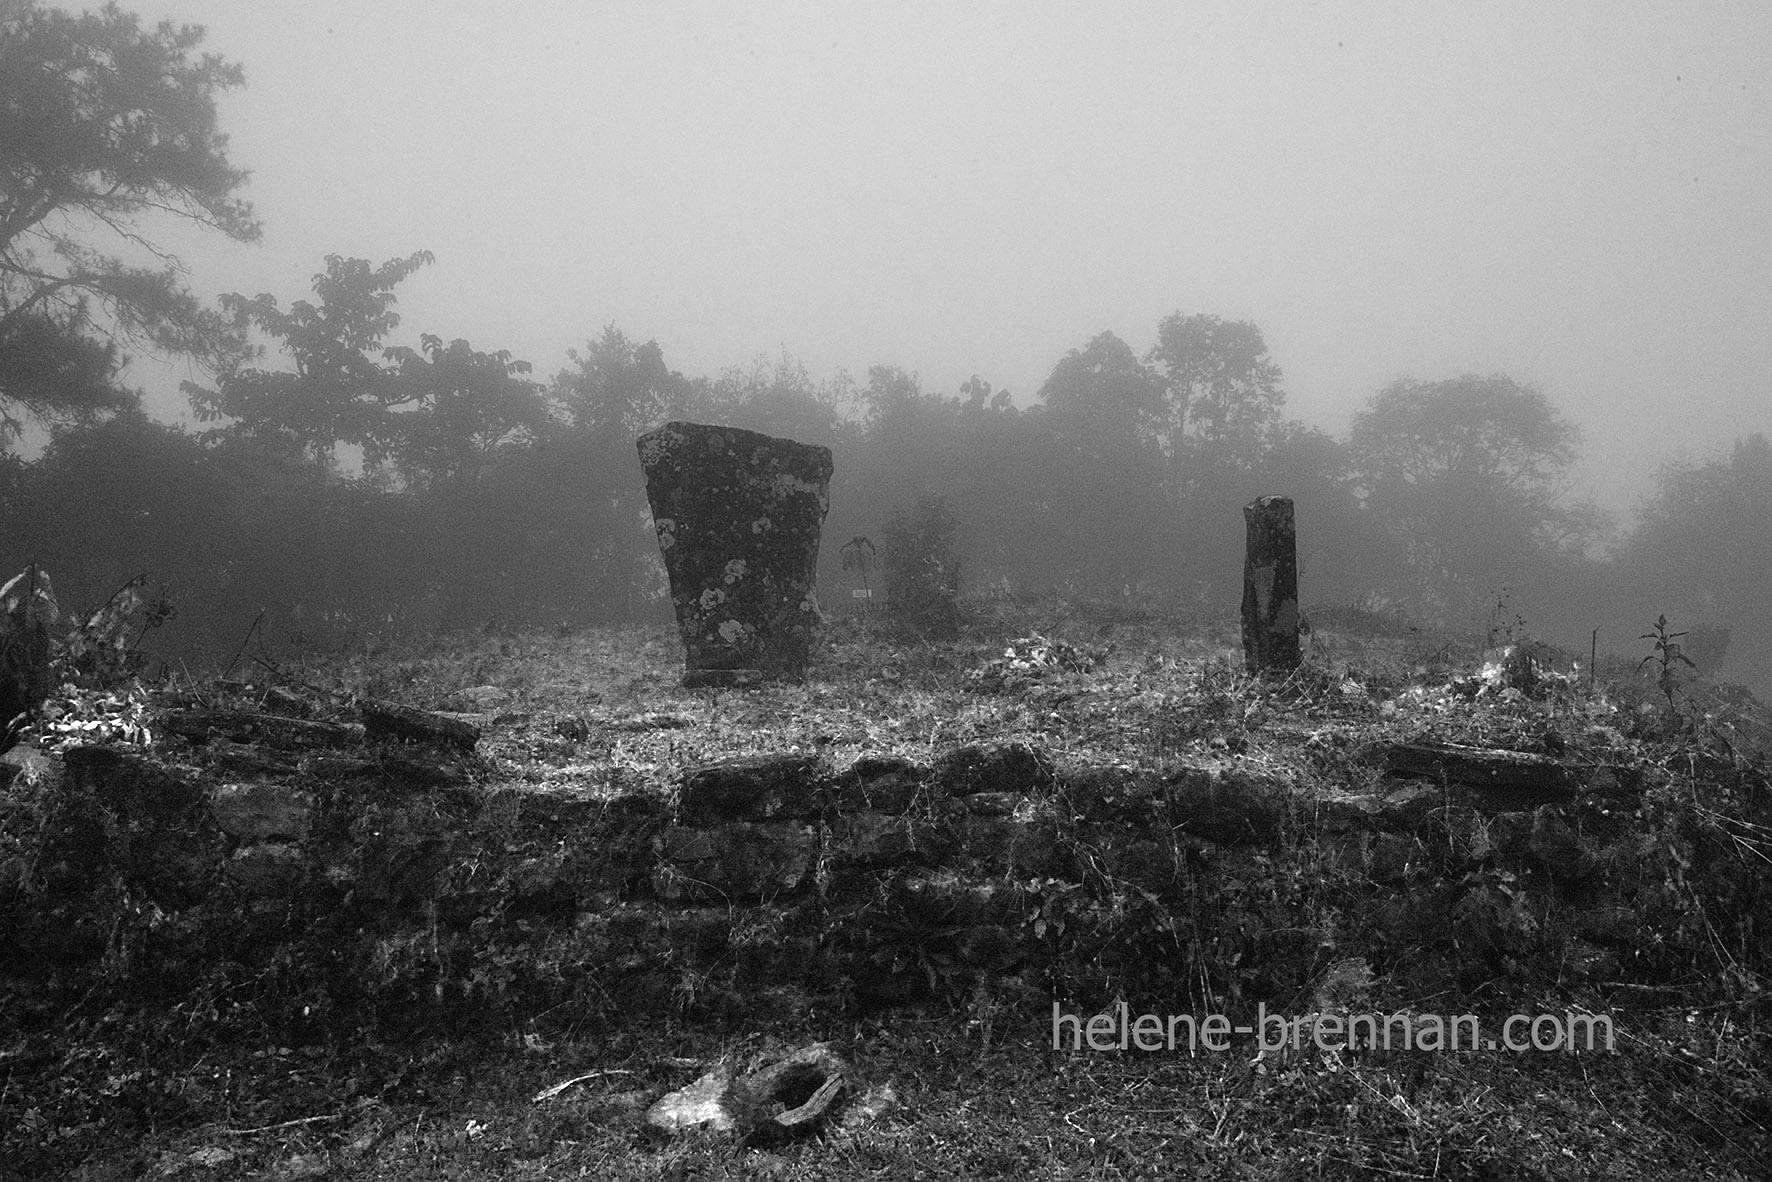 DSC_1137 childrens gravestones mizoram bw